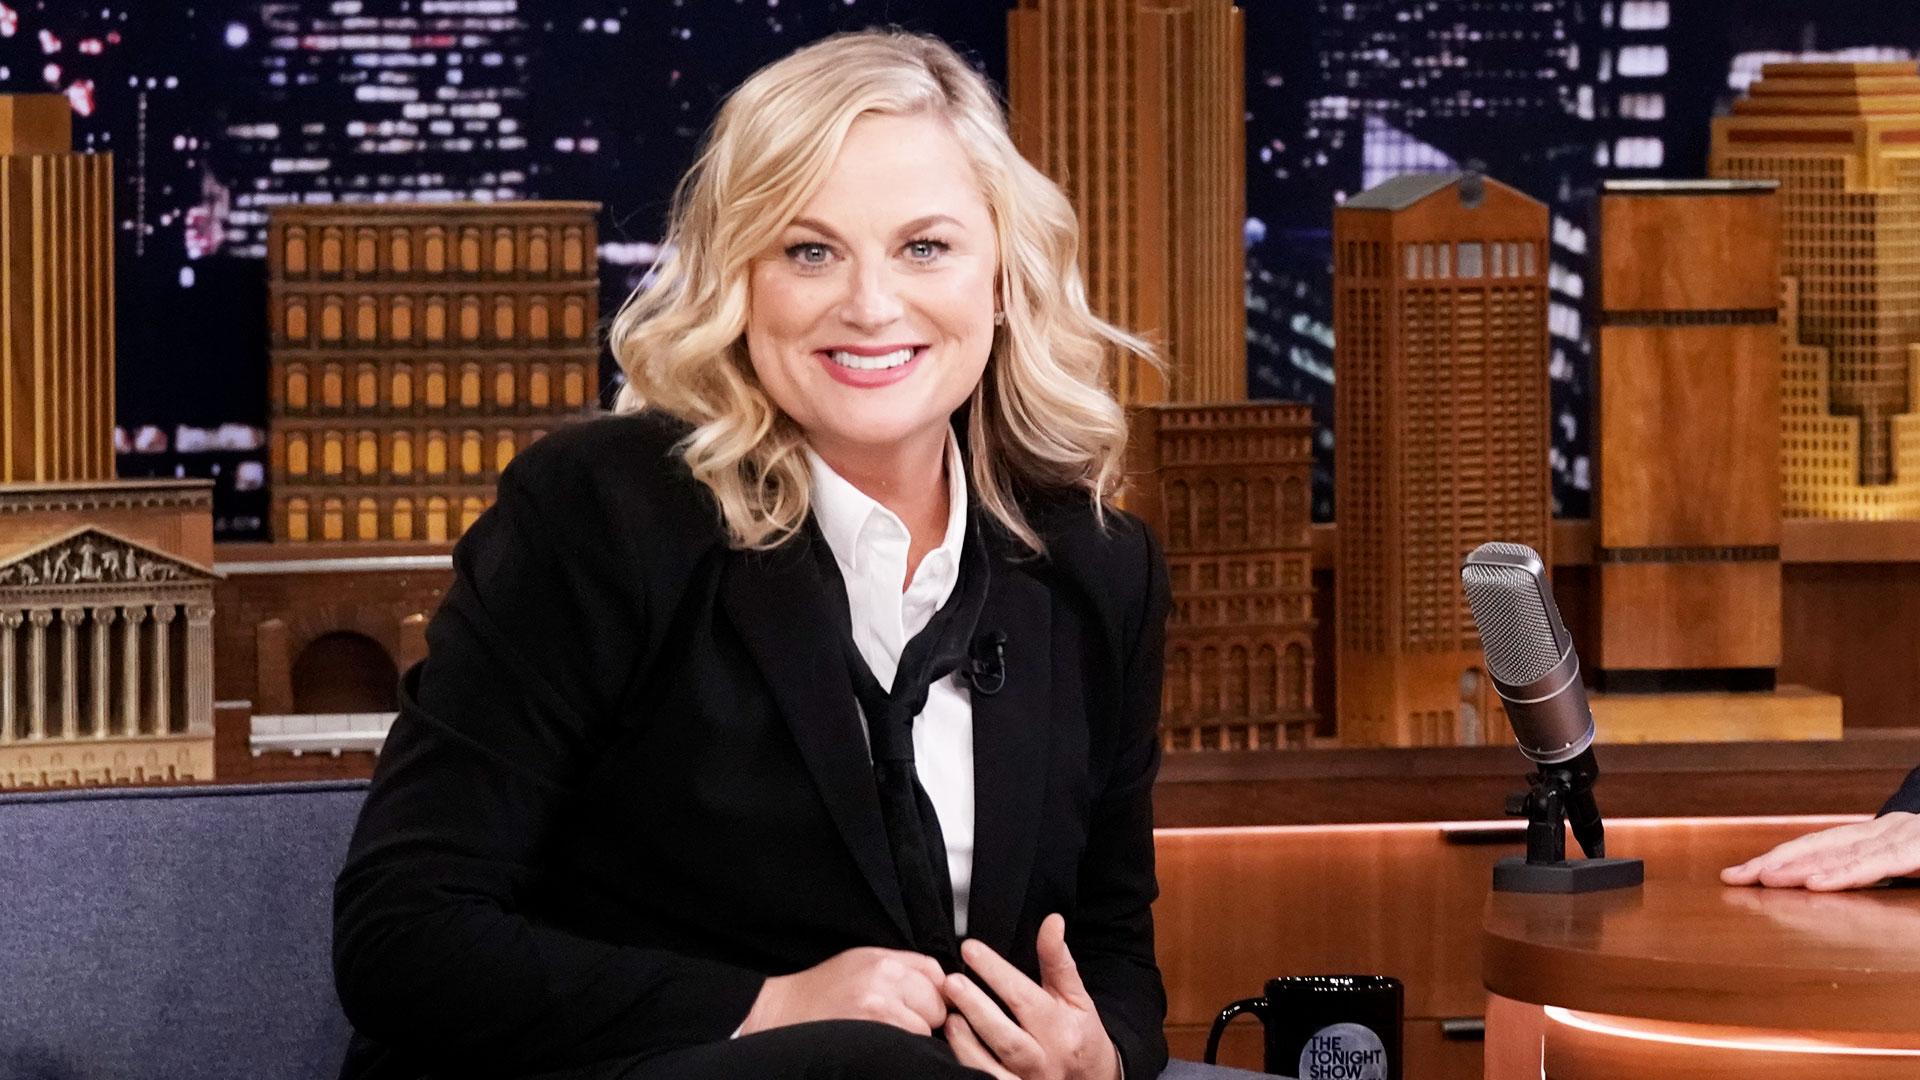 Watch The Tonight Show Starring Jimmy Fallon Episode: Amy